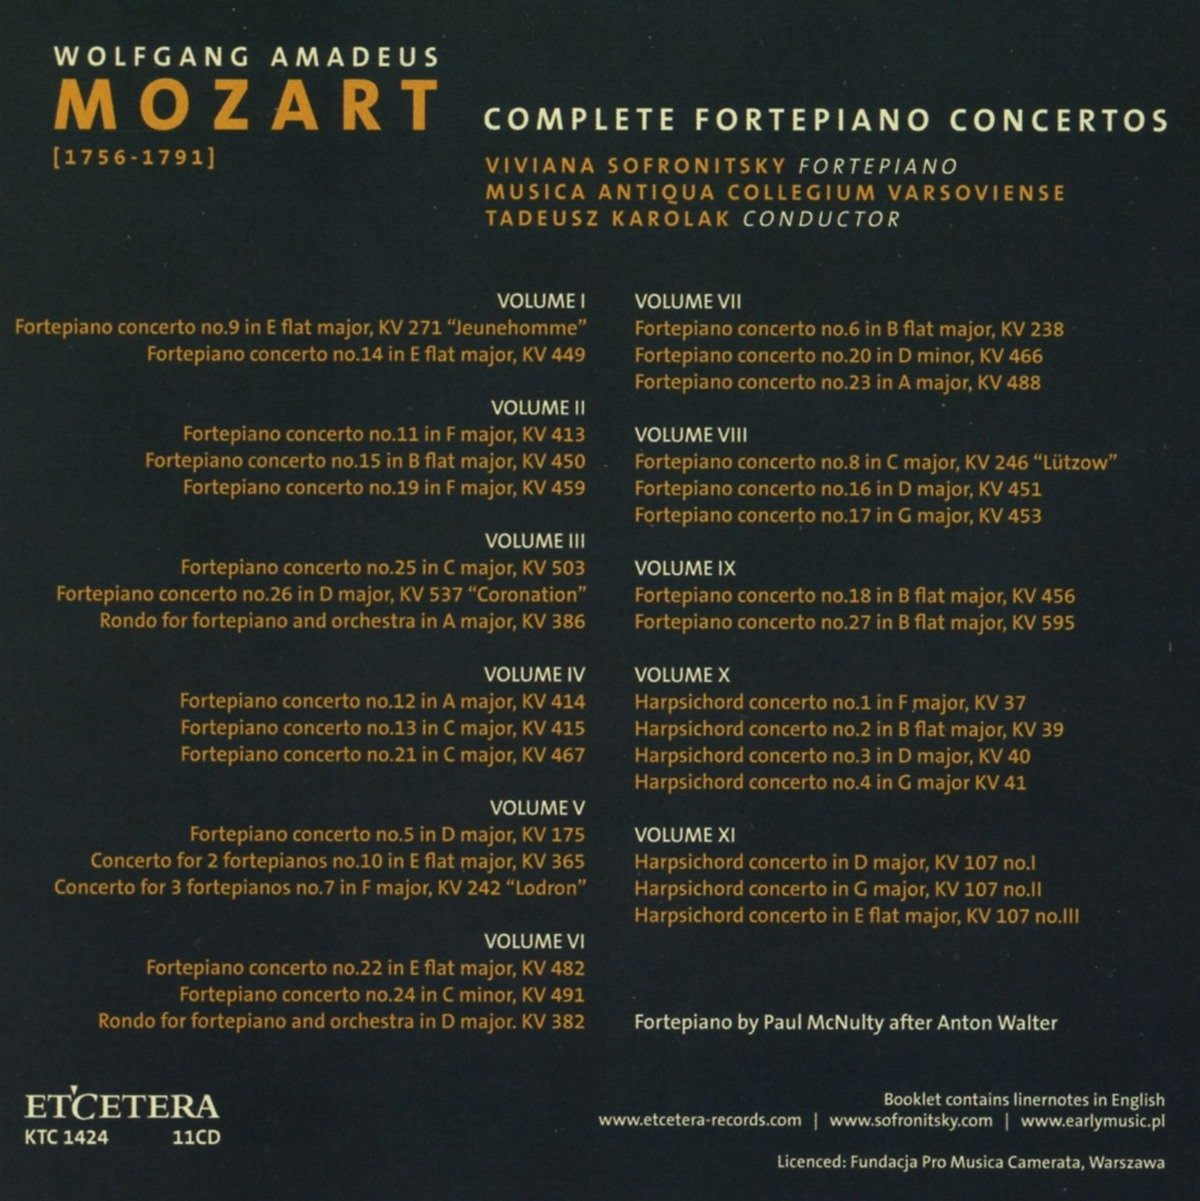 Intégrale des Concertos pour piano: Wolfgang Amadeus Mozart, Tadeusz Karolak: Amazon.es: Música